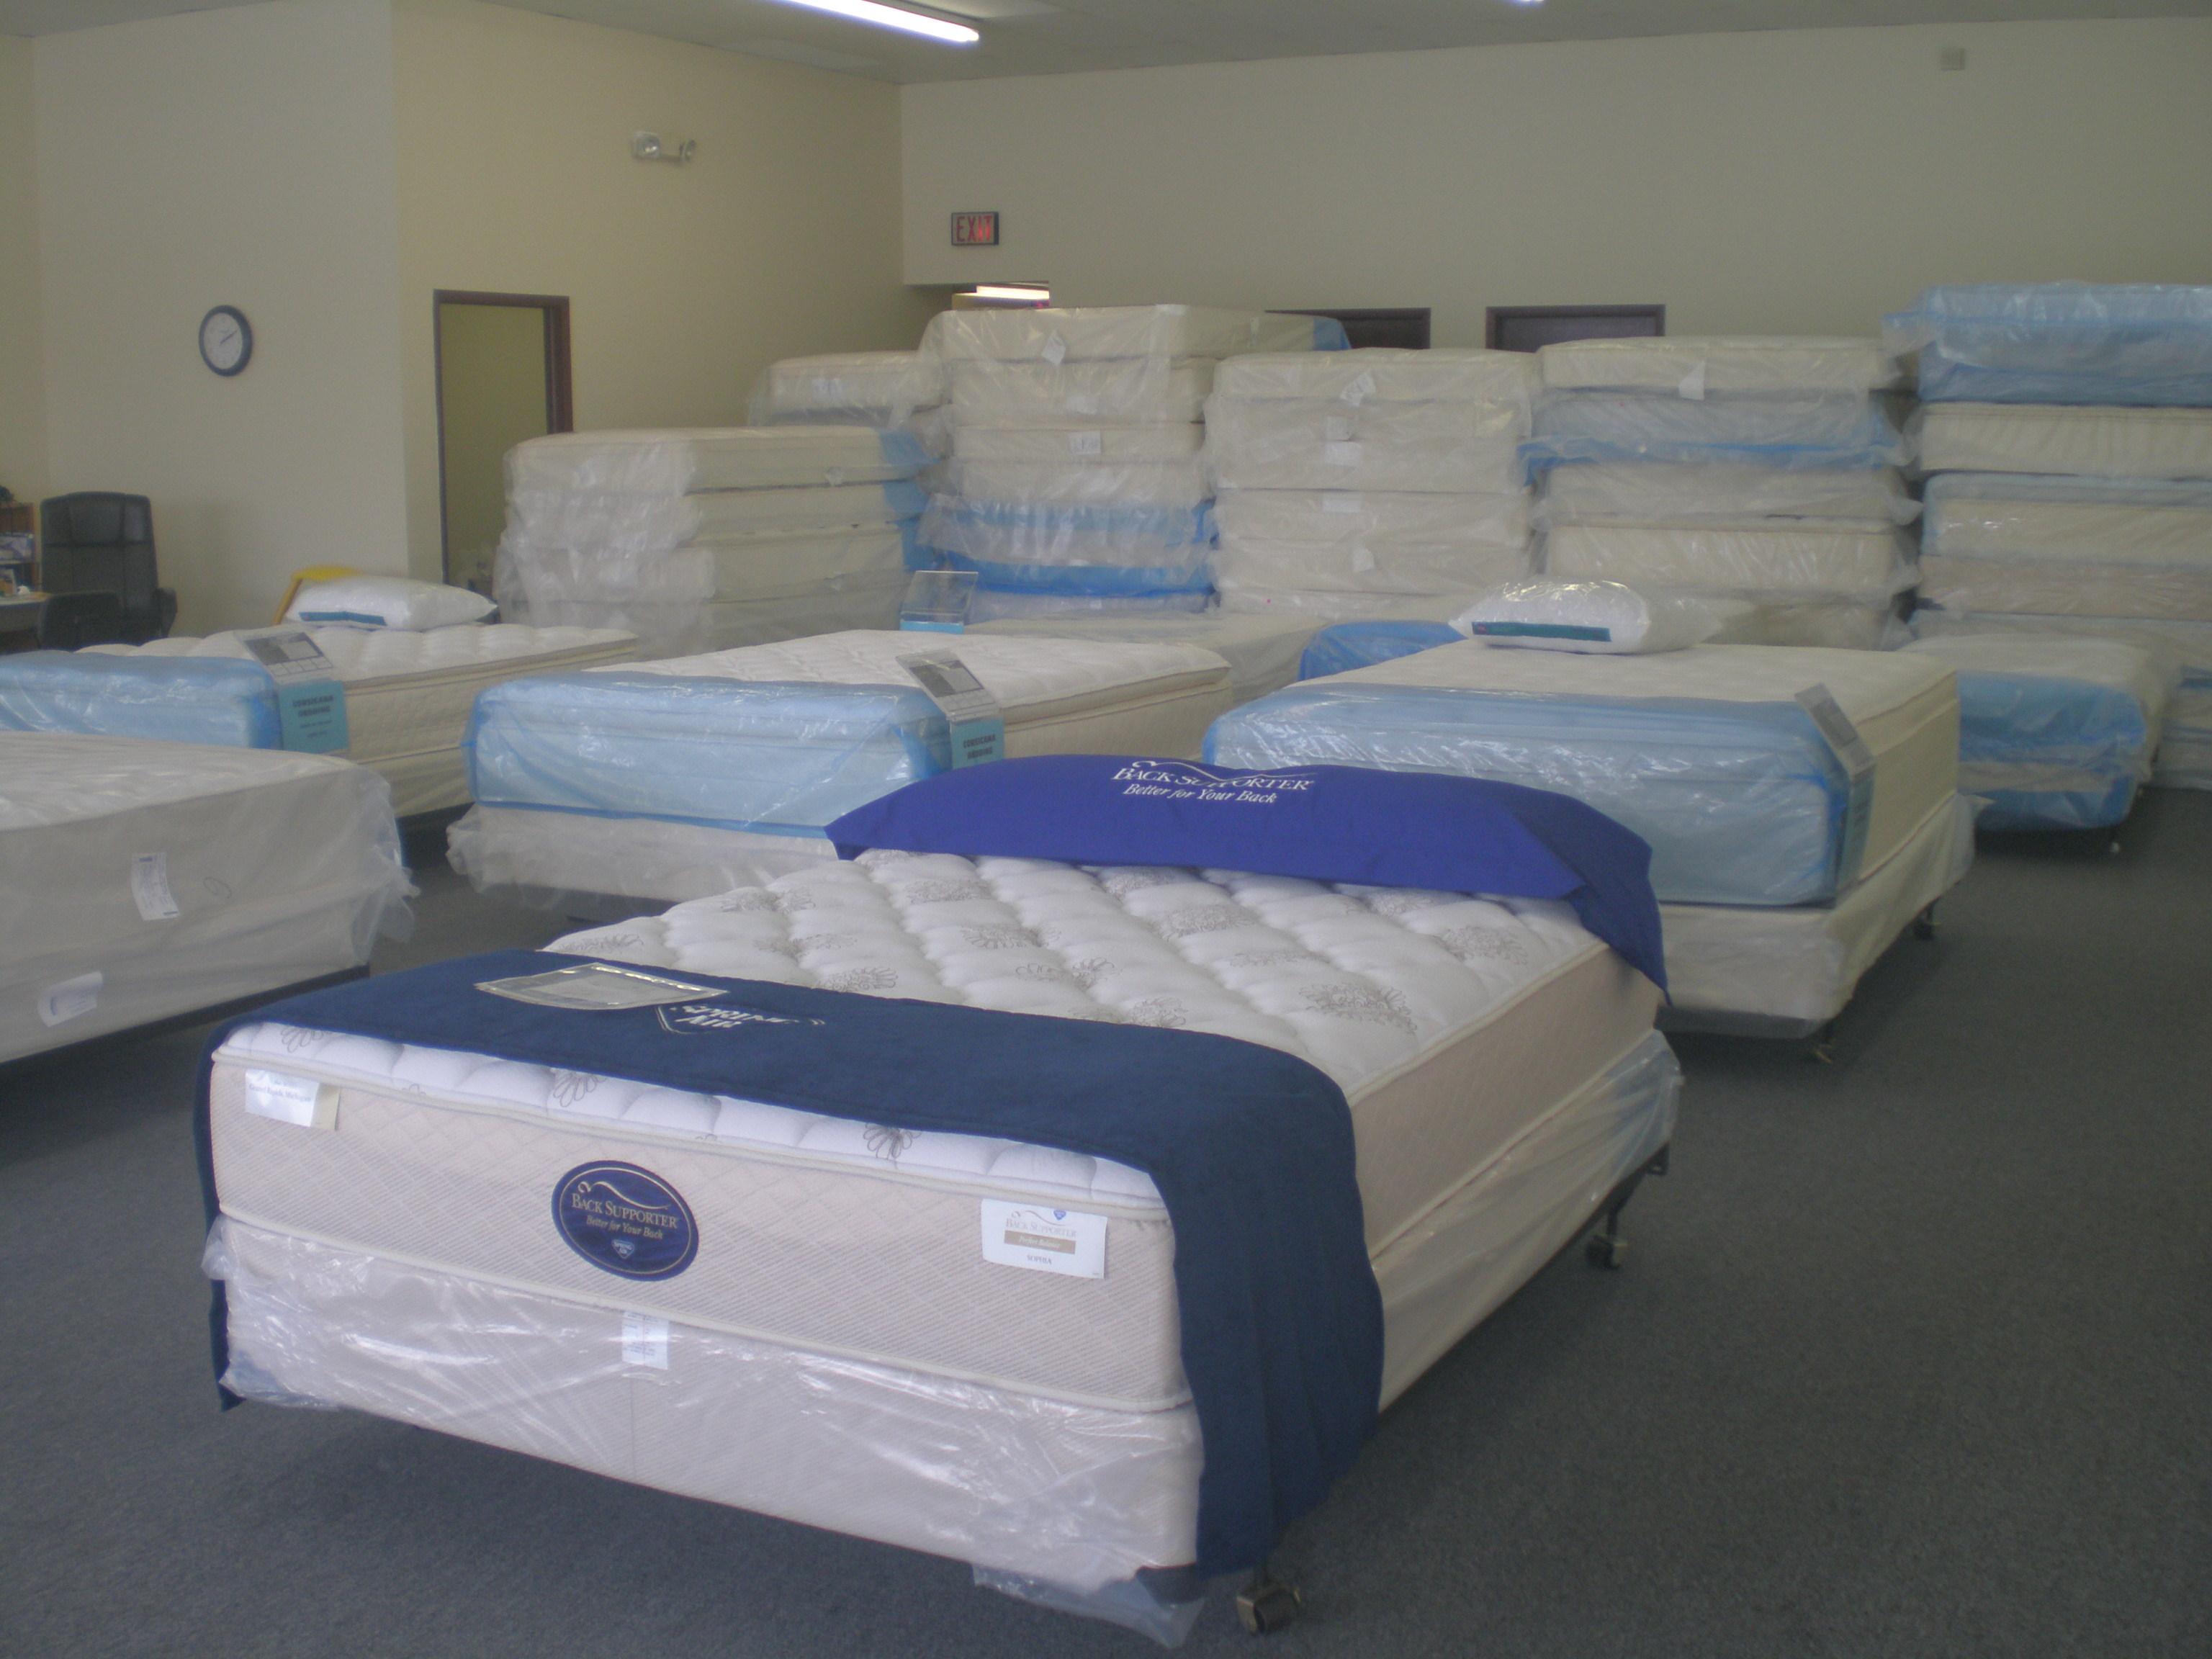 farmington mattress reviews outlet mattresses serta icomfort insight hills restonic factory